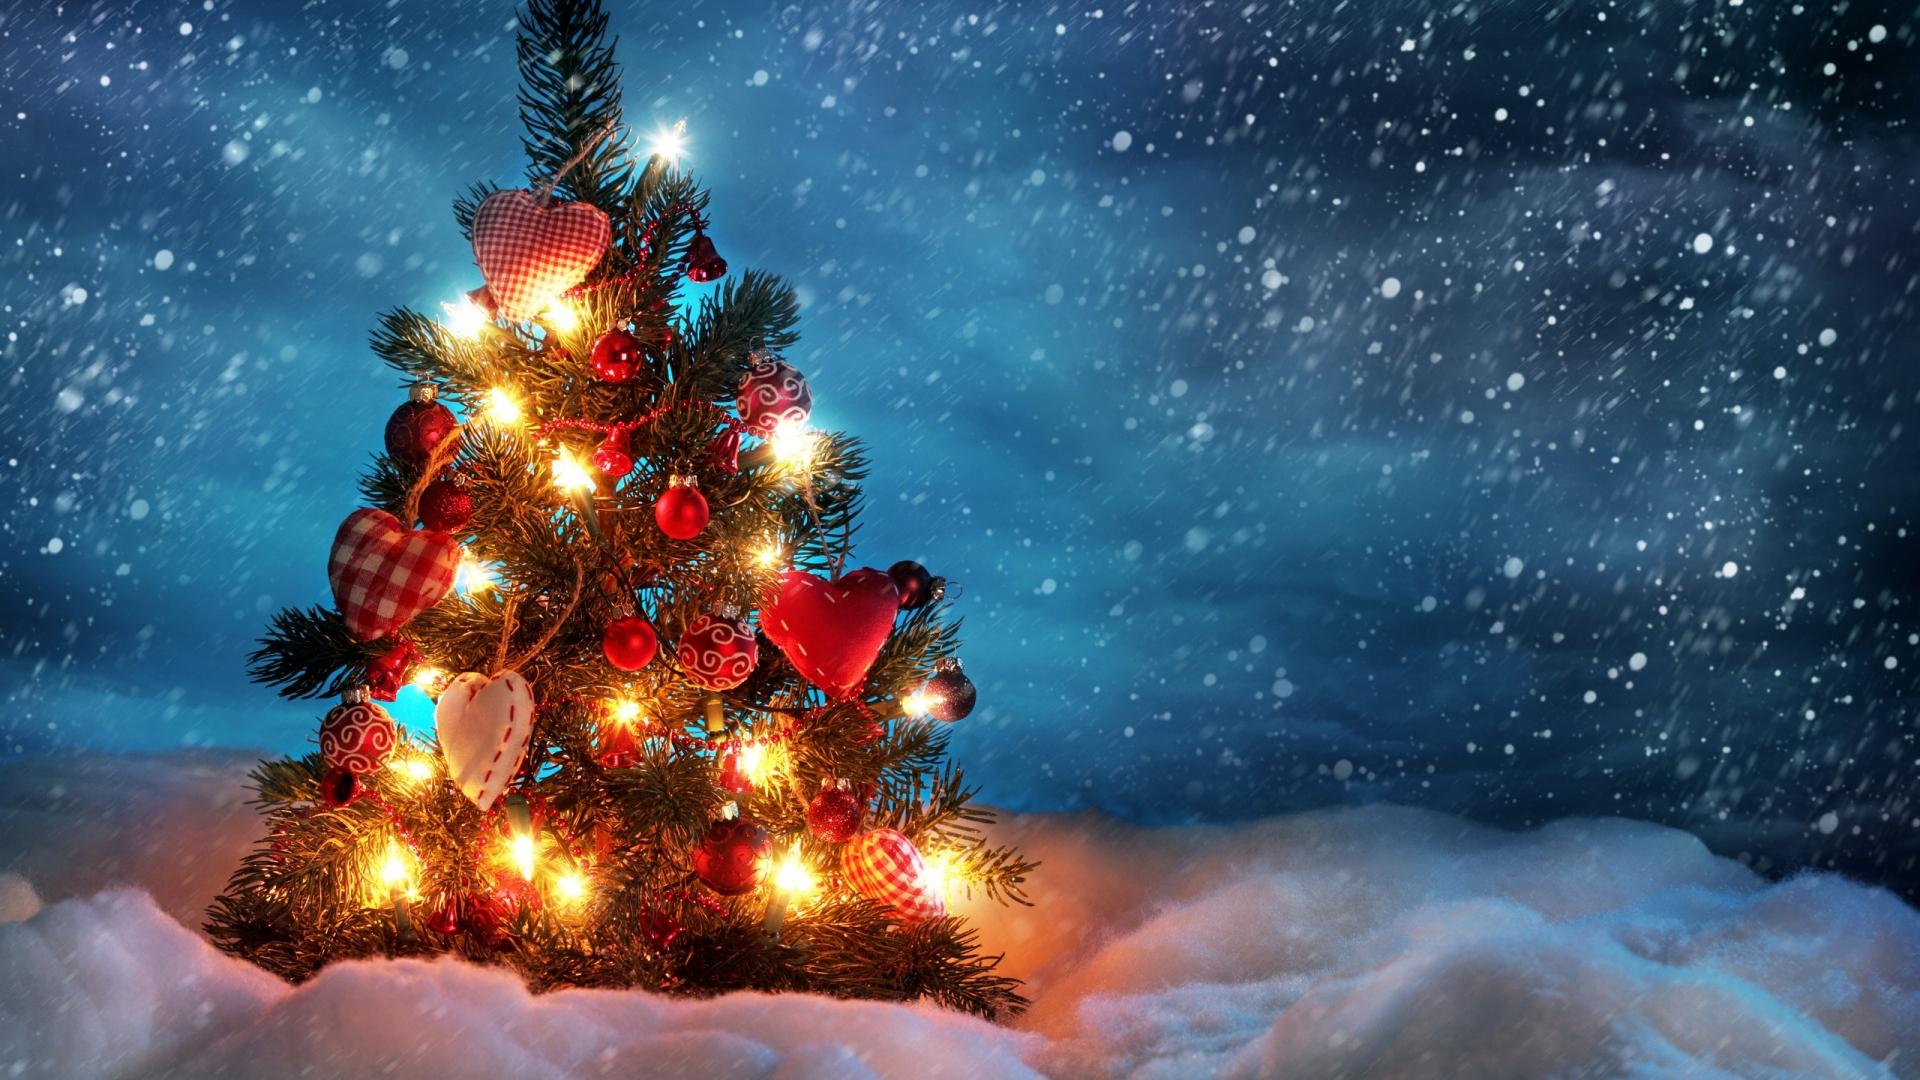 Free Download Cute Christmas Tree Computer Desktop Wallpaper